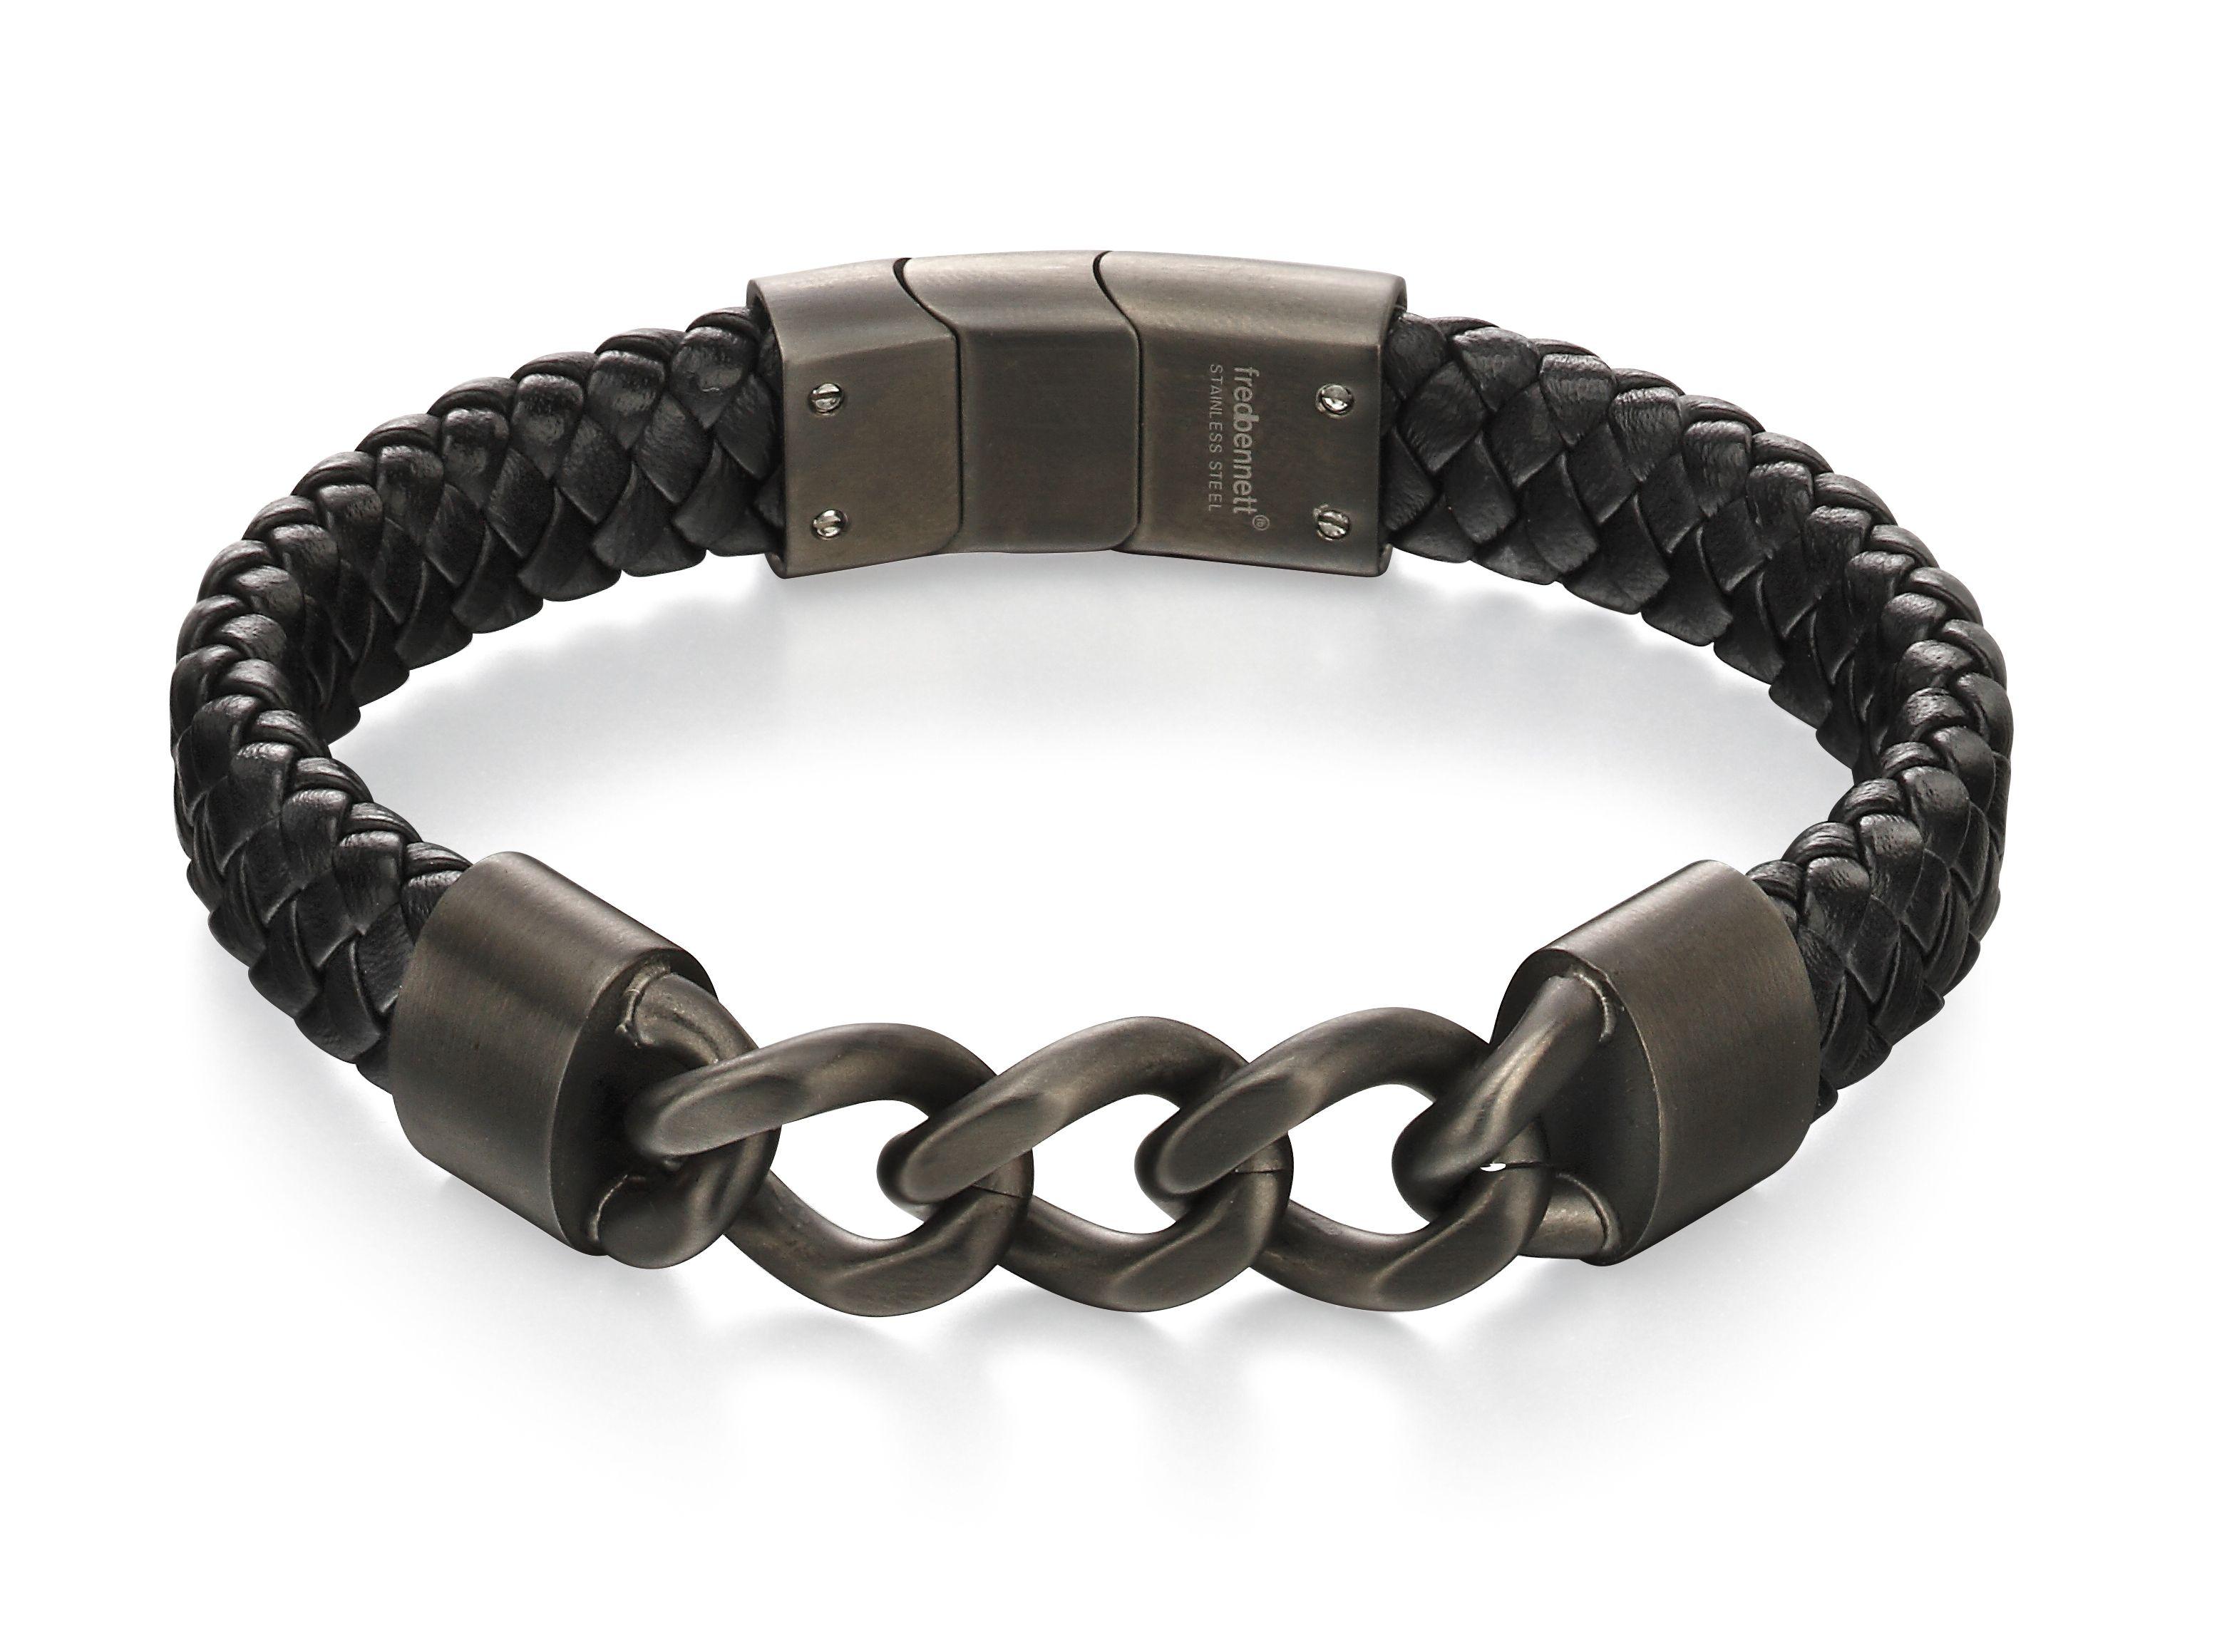 Fred Bennett Mens Skinny Stainless Steel & Brown Leather Magnetic Clasp Bracelet of Length 19cm